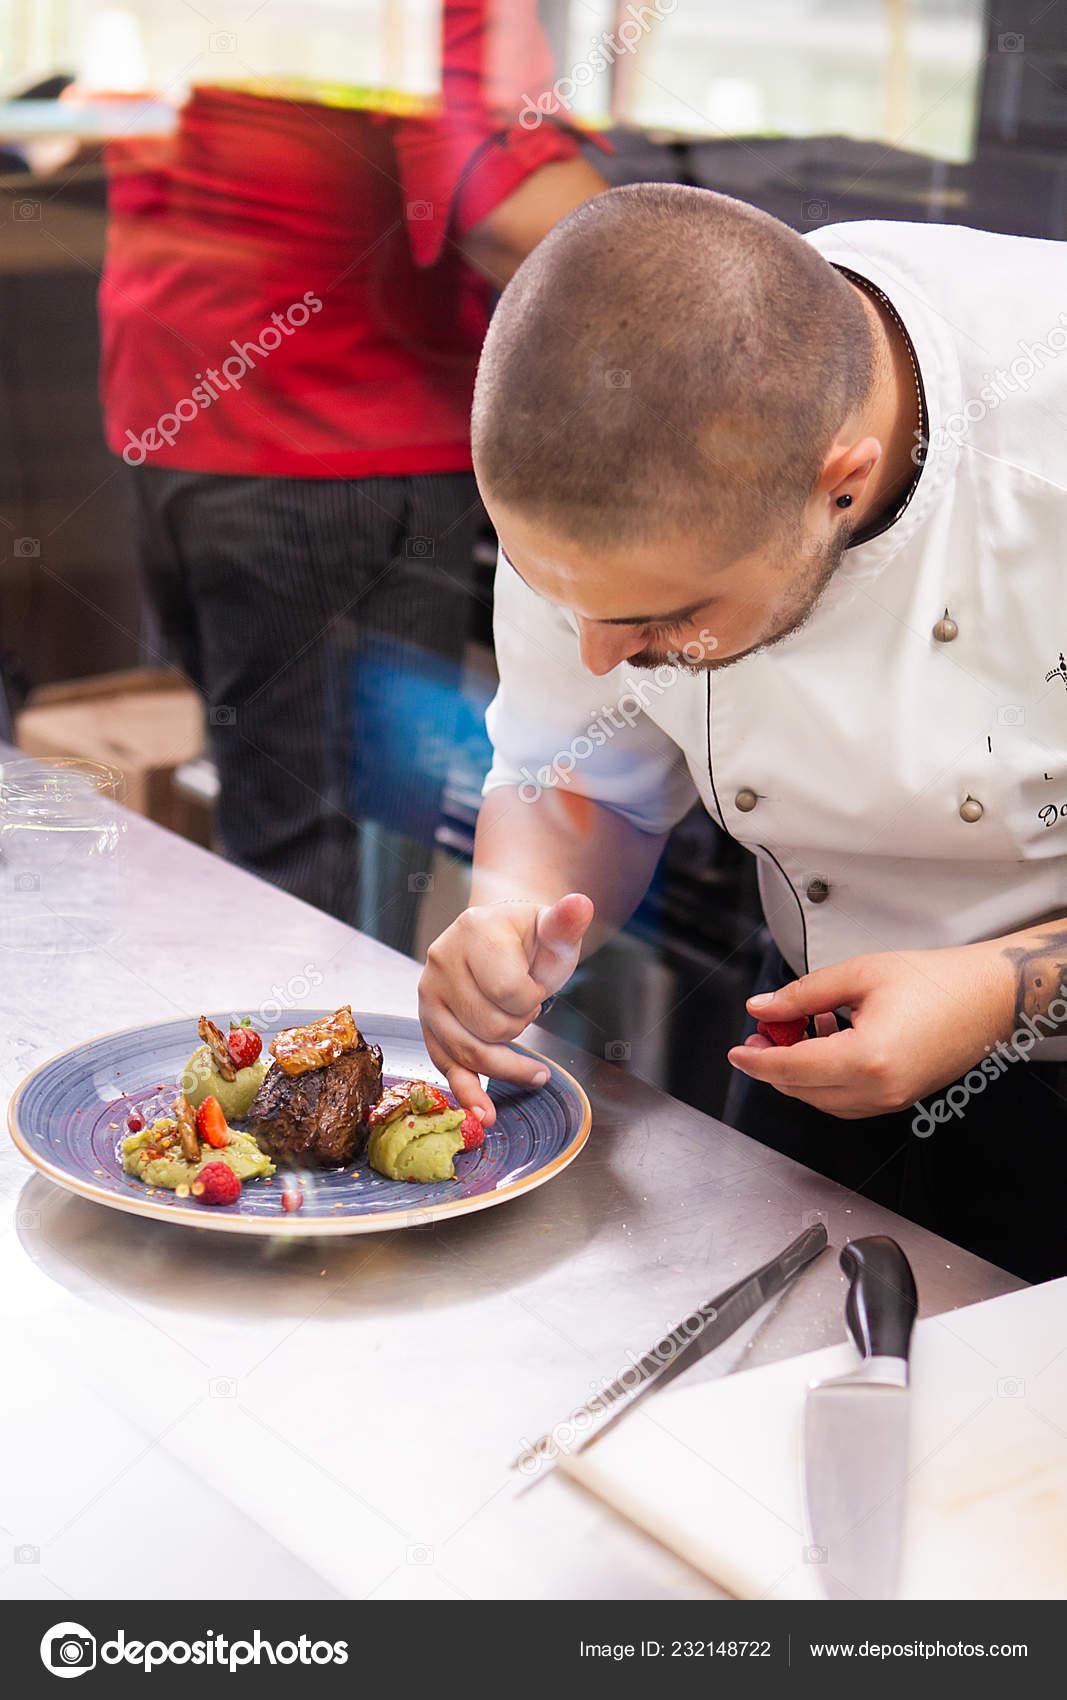 Professional Food Decoration In Restaurant Kitchen Stock Photo C Dragoscondreaw 232148722